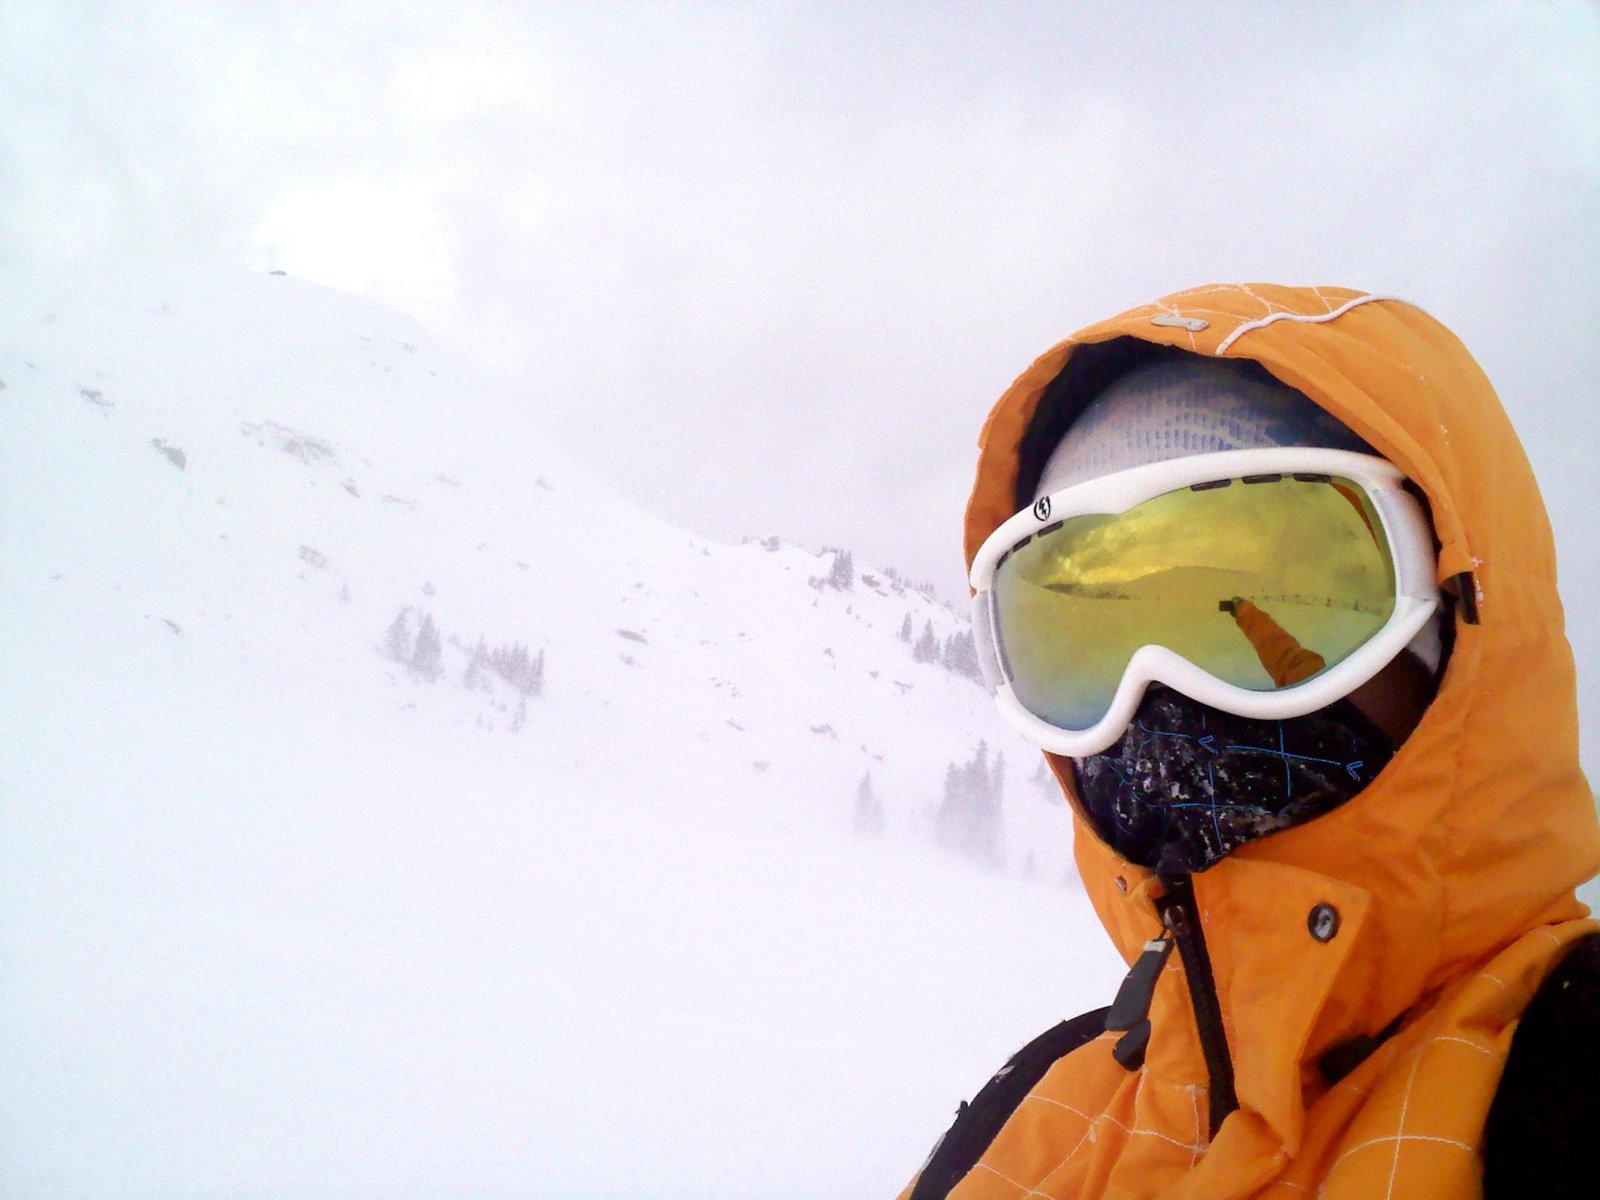 Craig on Vail Pass